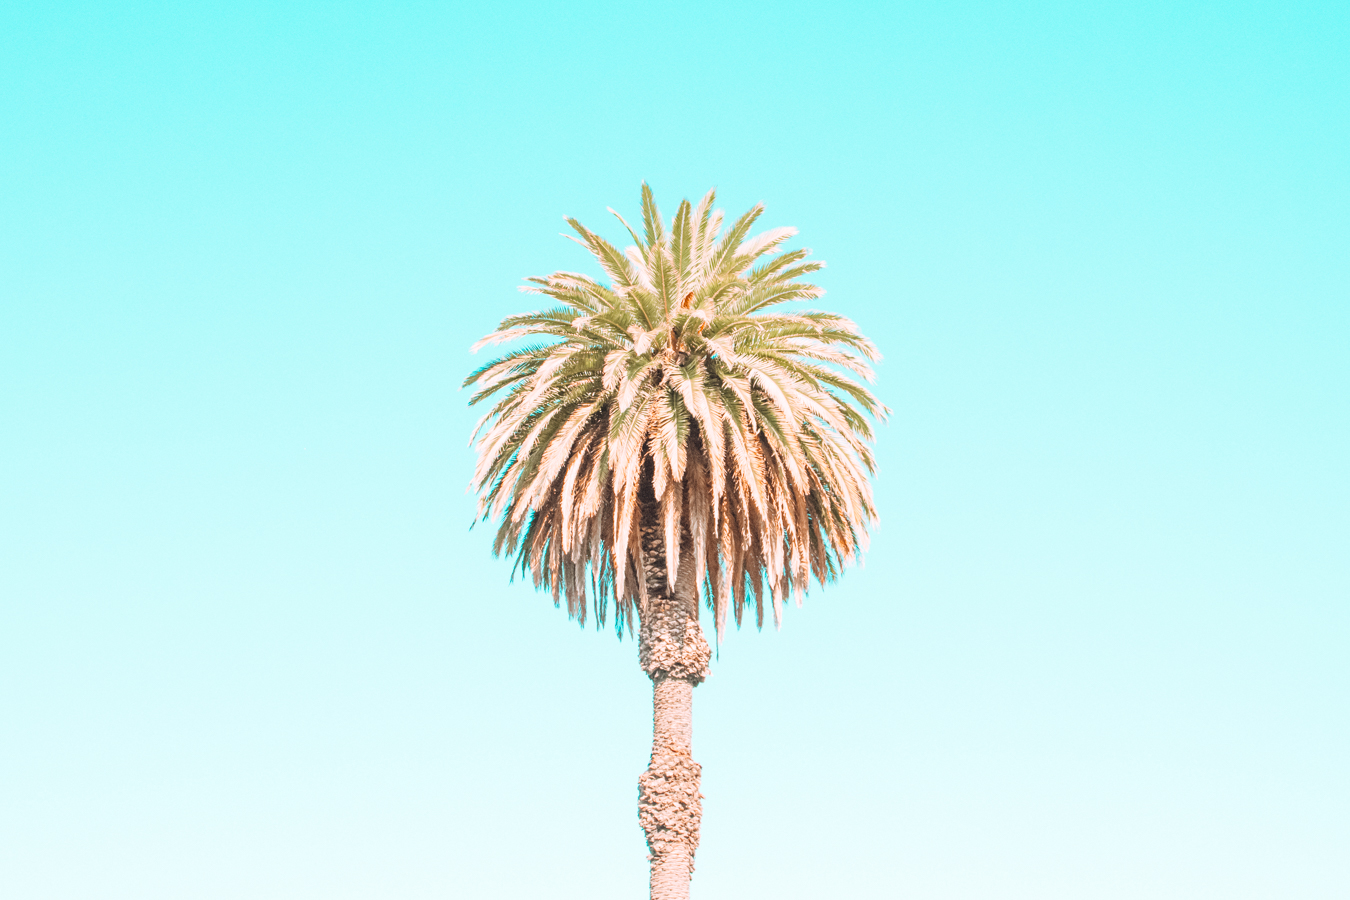 Palm tree in Oakland